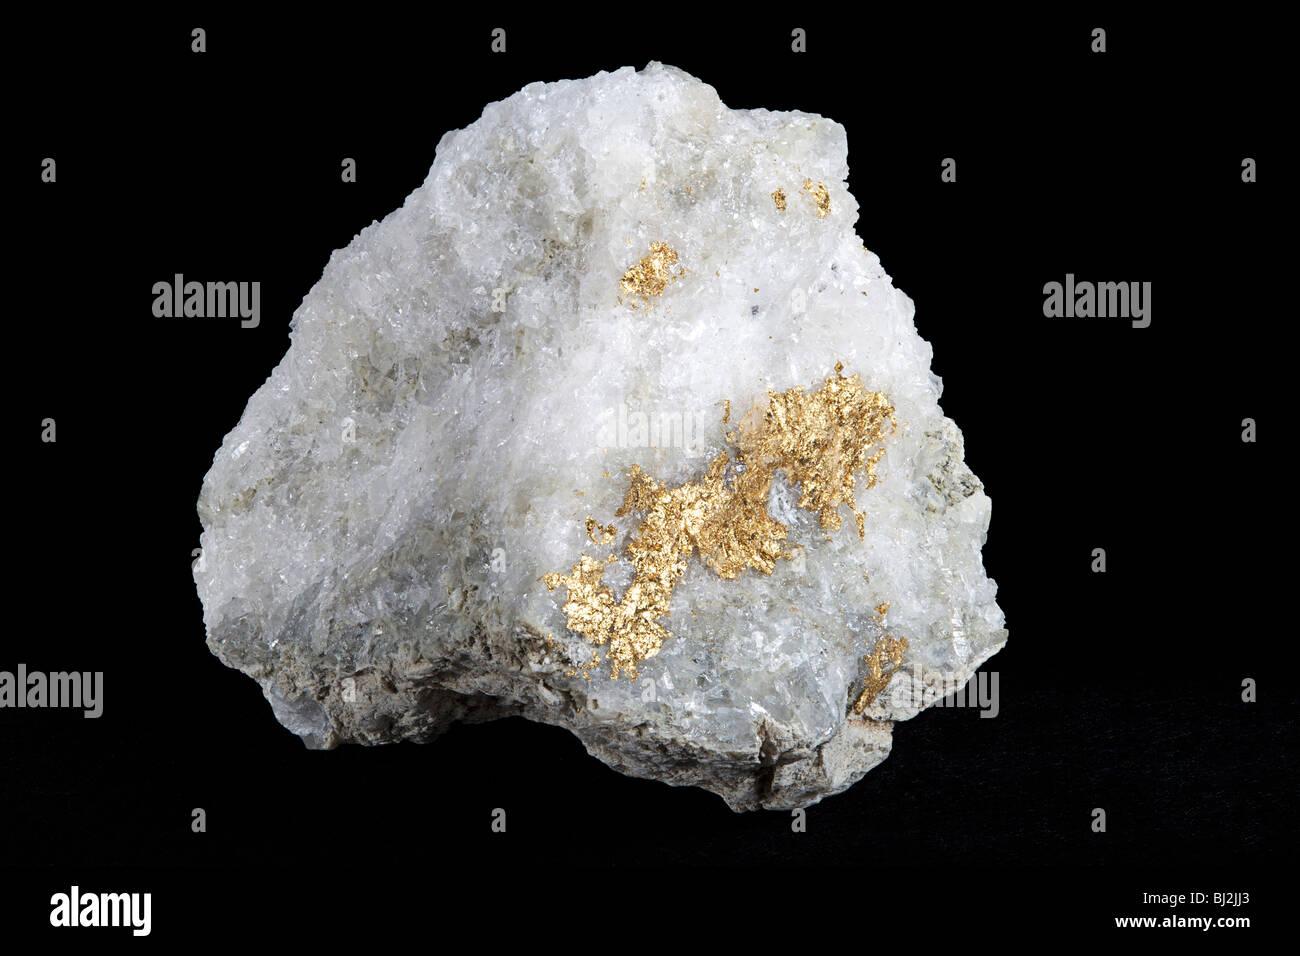 Gold on quartz, Arizona - Stock Image